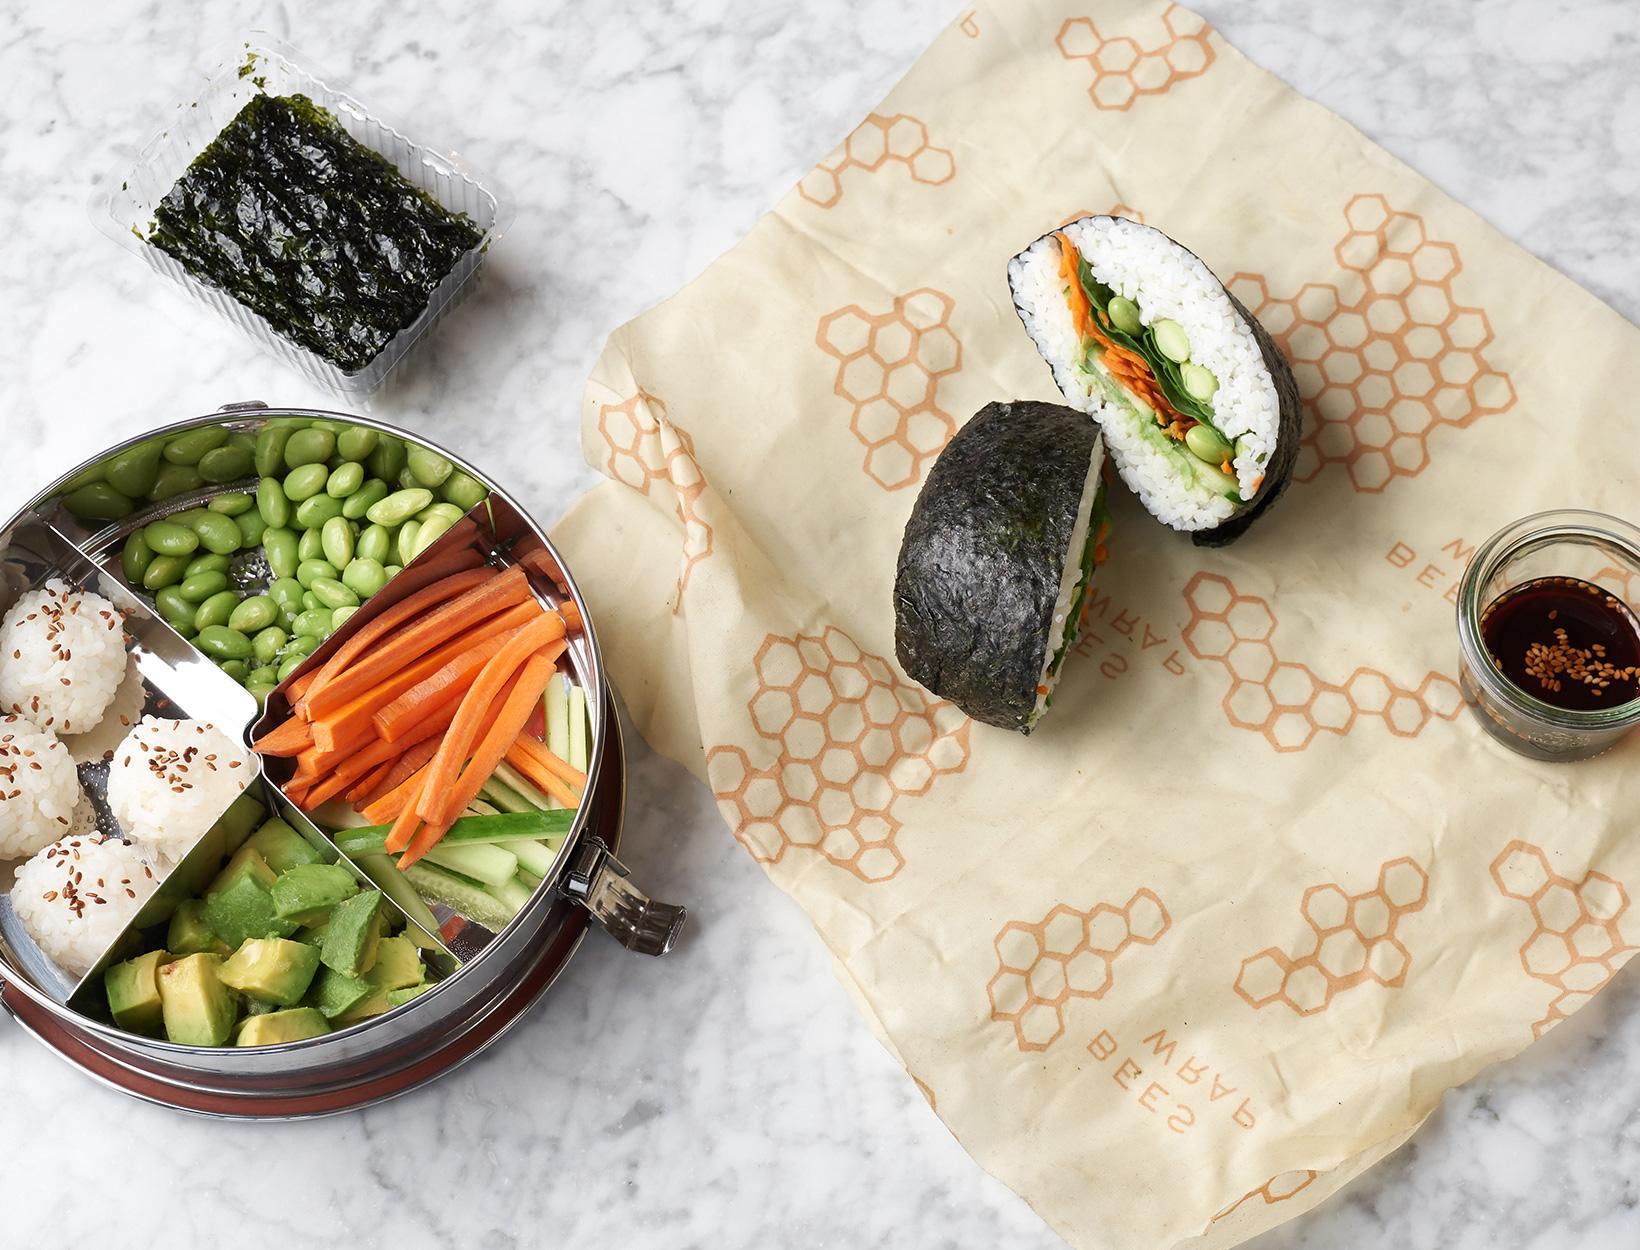 Double-Duty Sushi Lunch